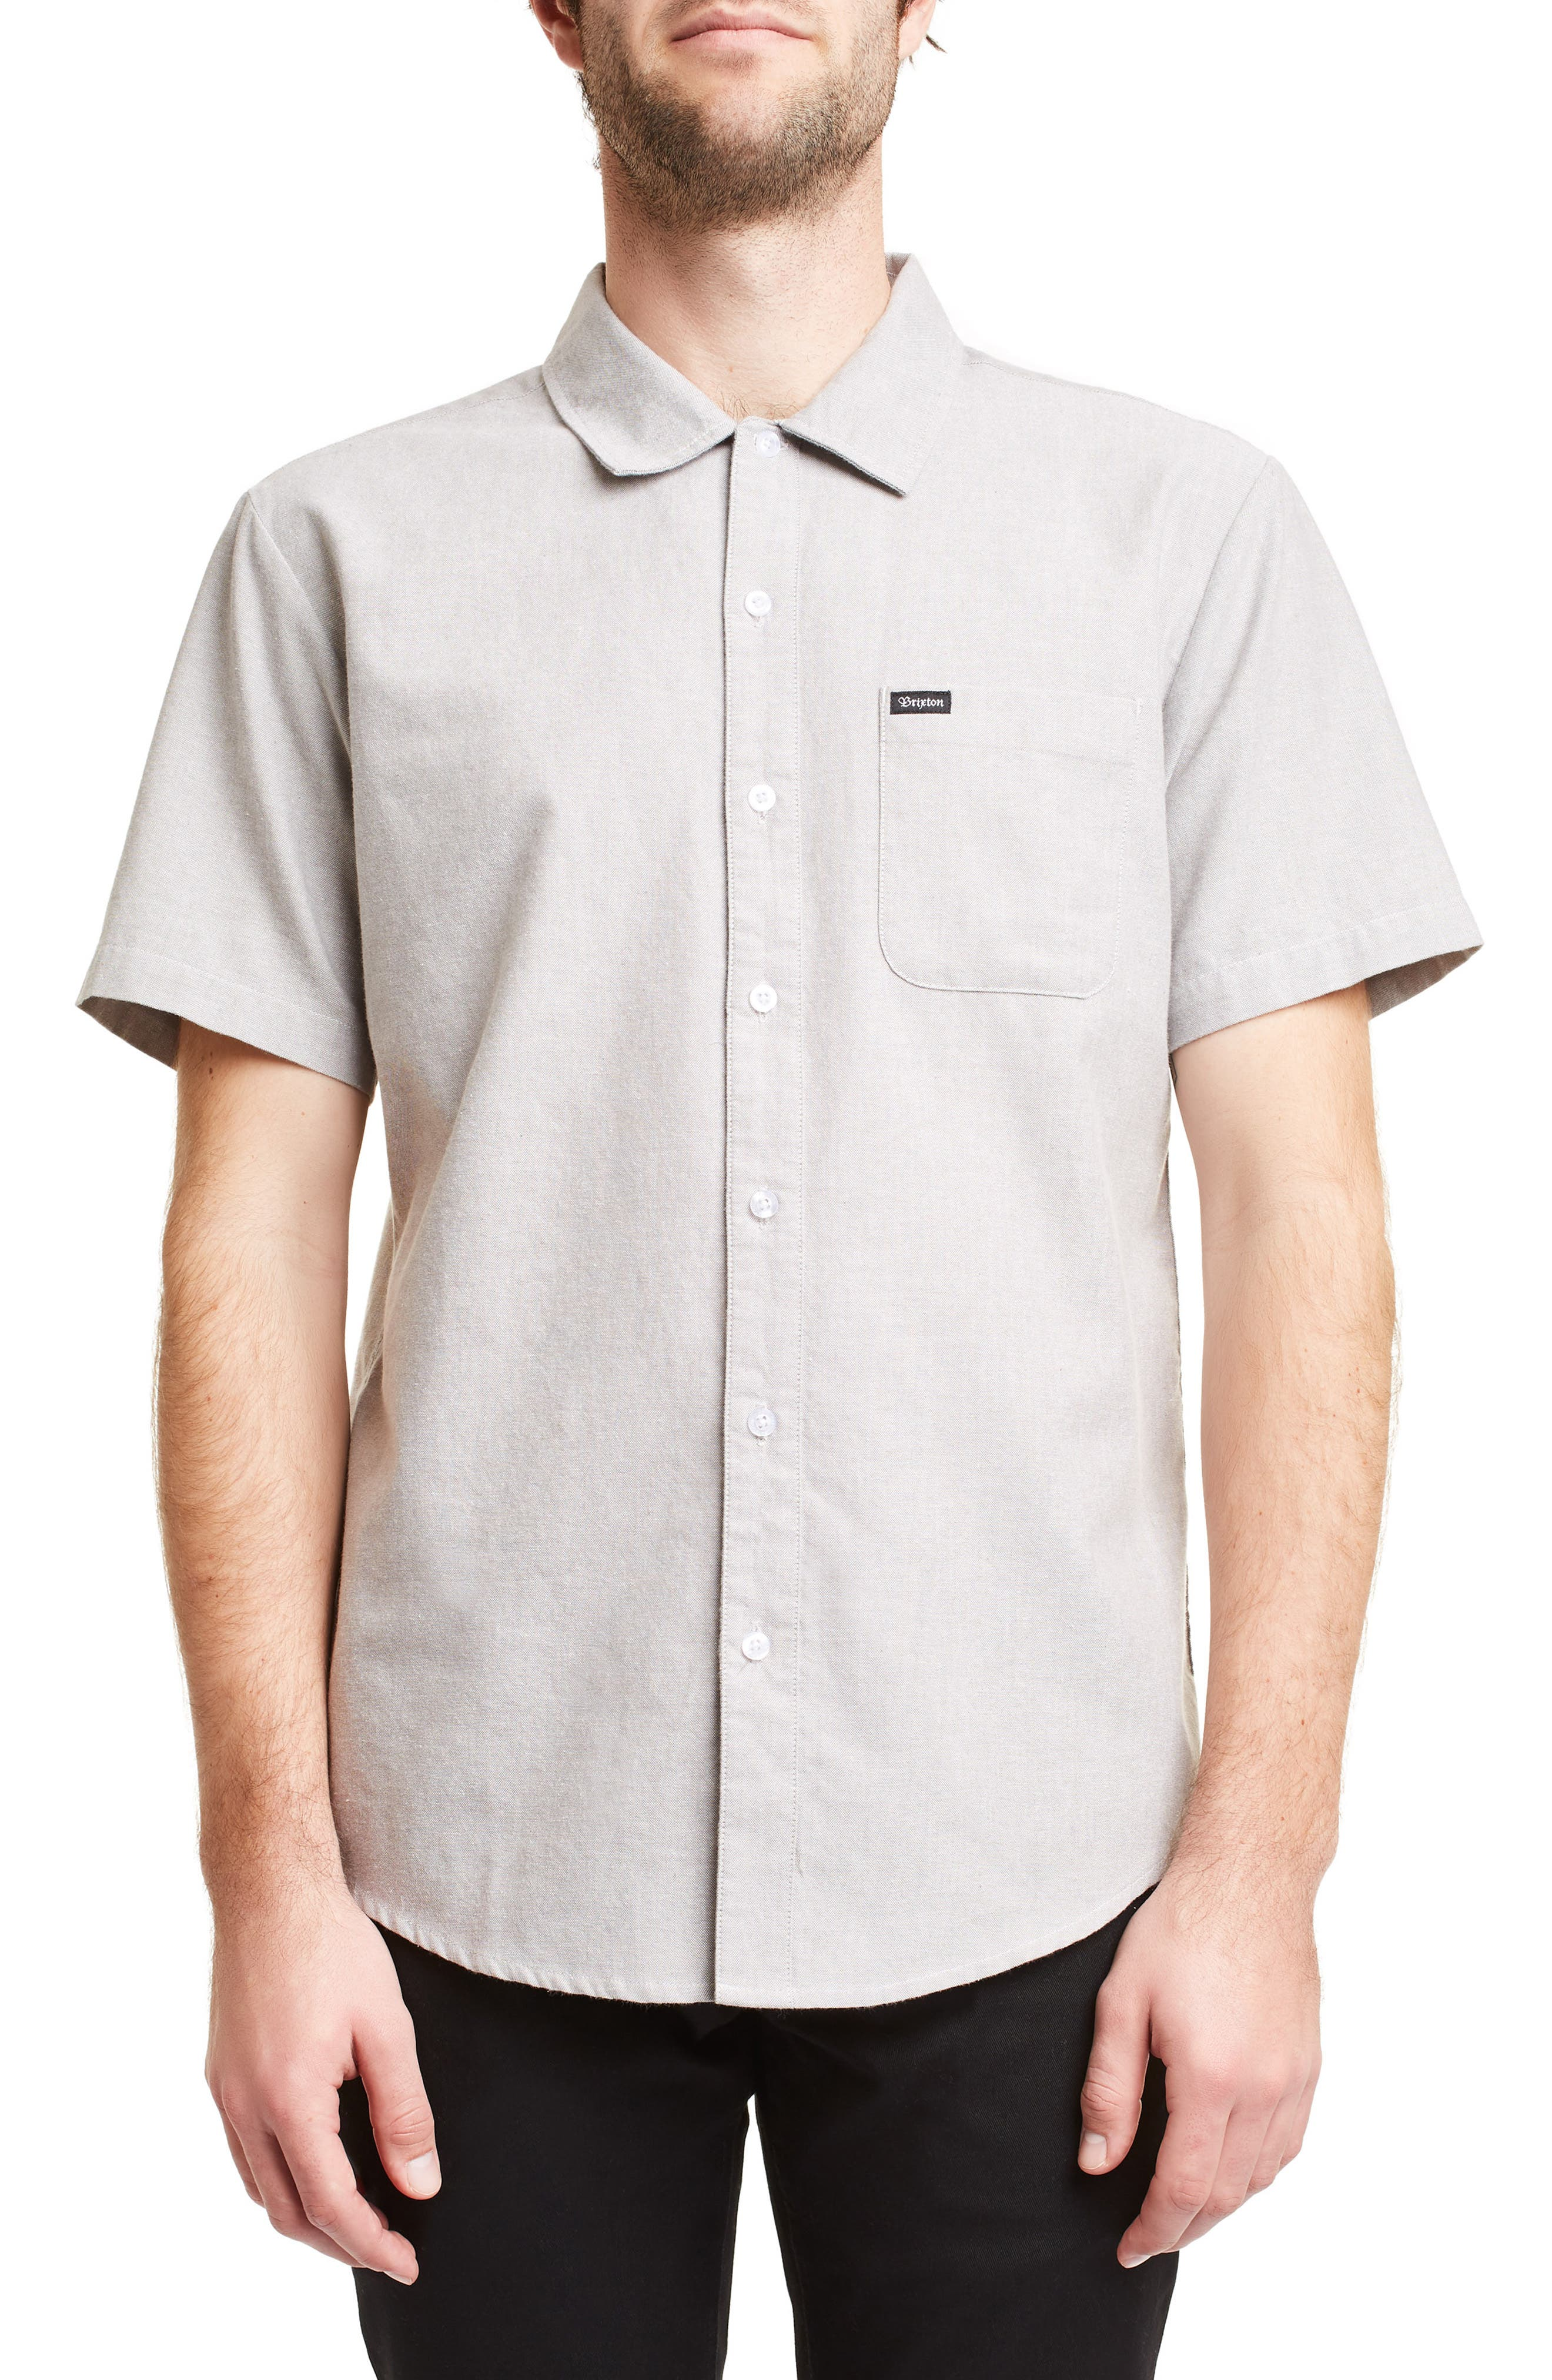 Charter Oxford Woven Shirt, Main, color, 050